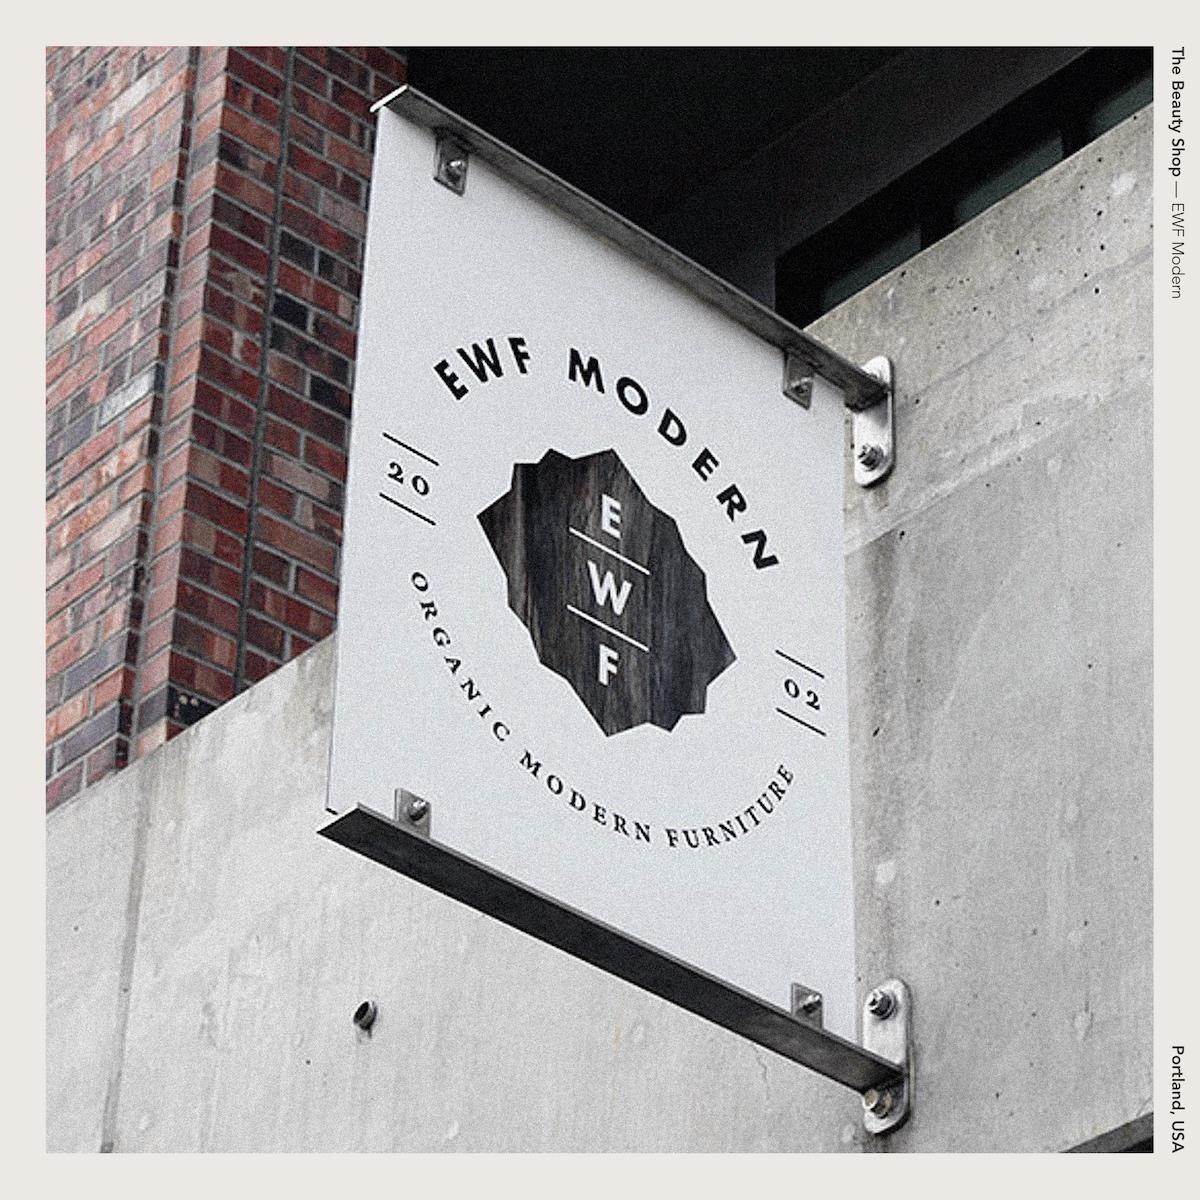 The Beauty Shop — EWF Modern